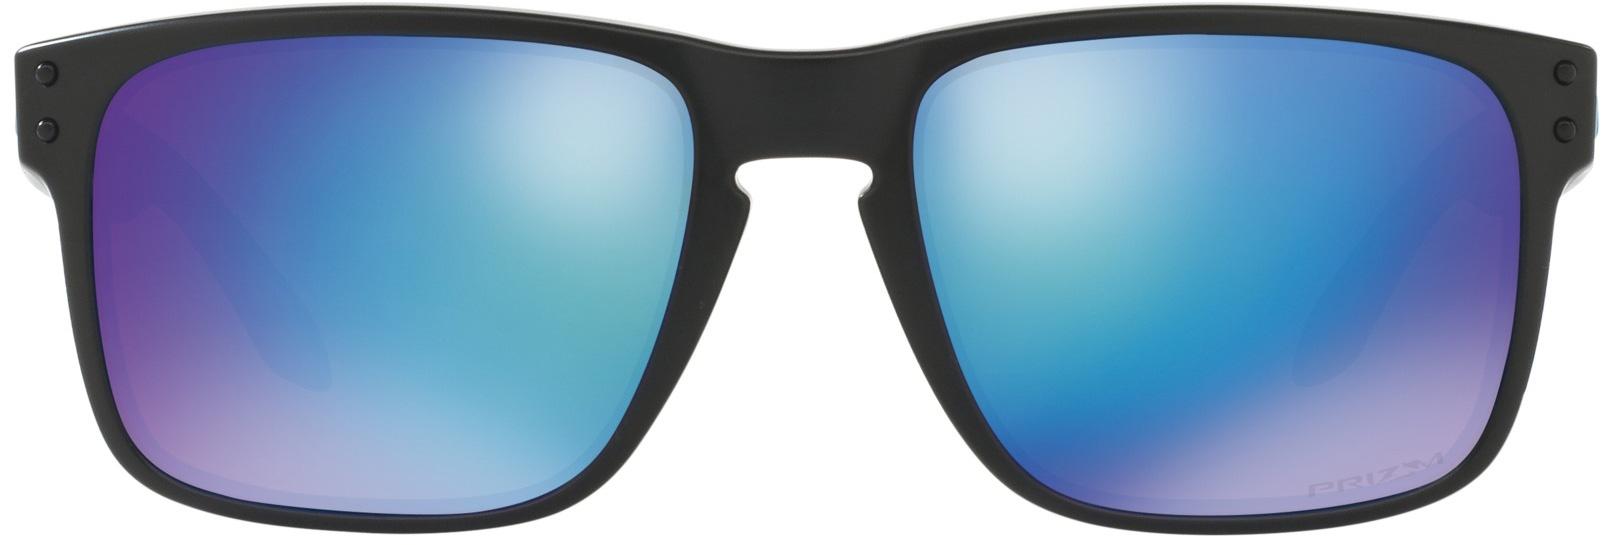 856185822d HOLBROOK Sunglasses sapphire fade prizm sapphire polarized